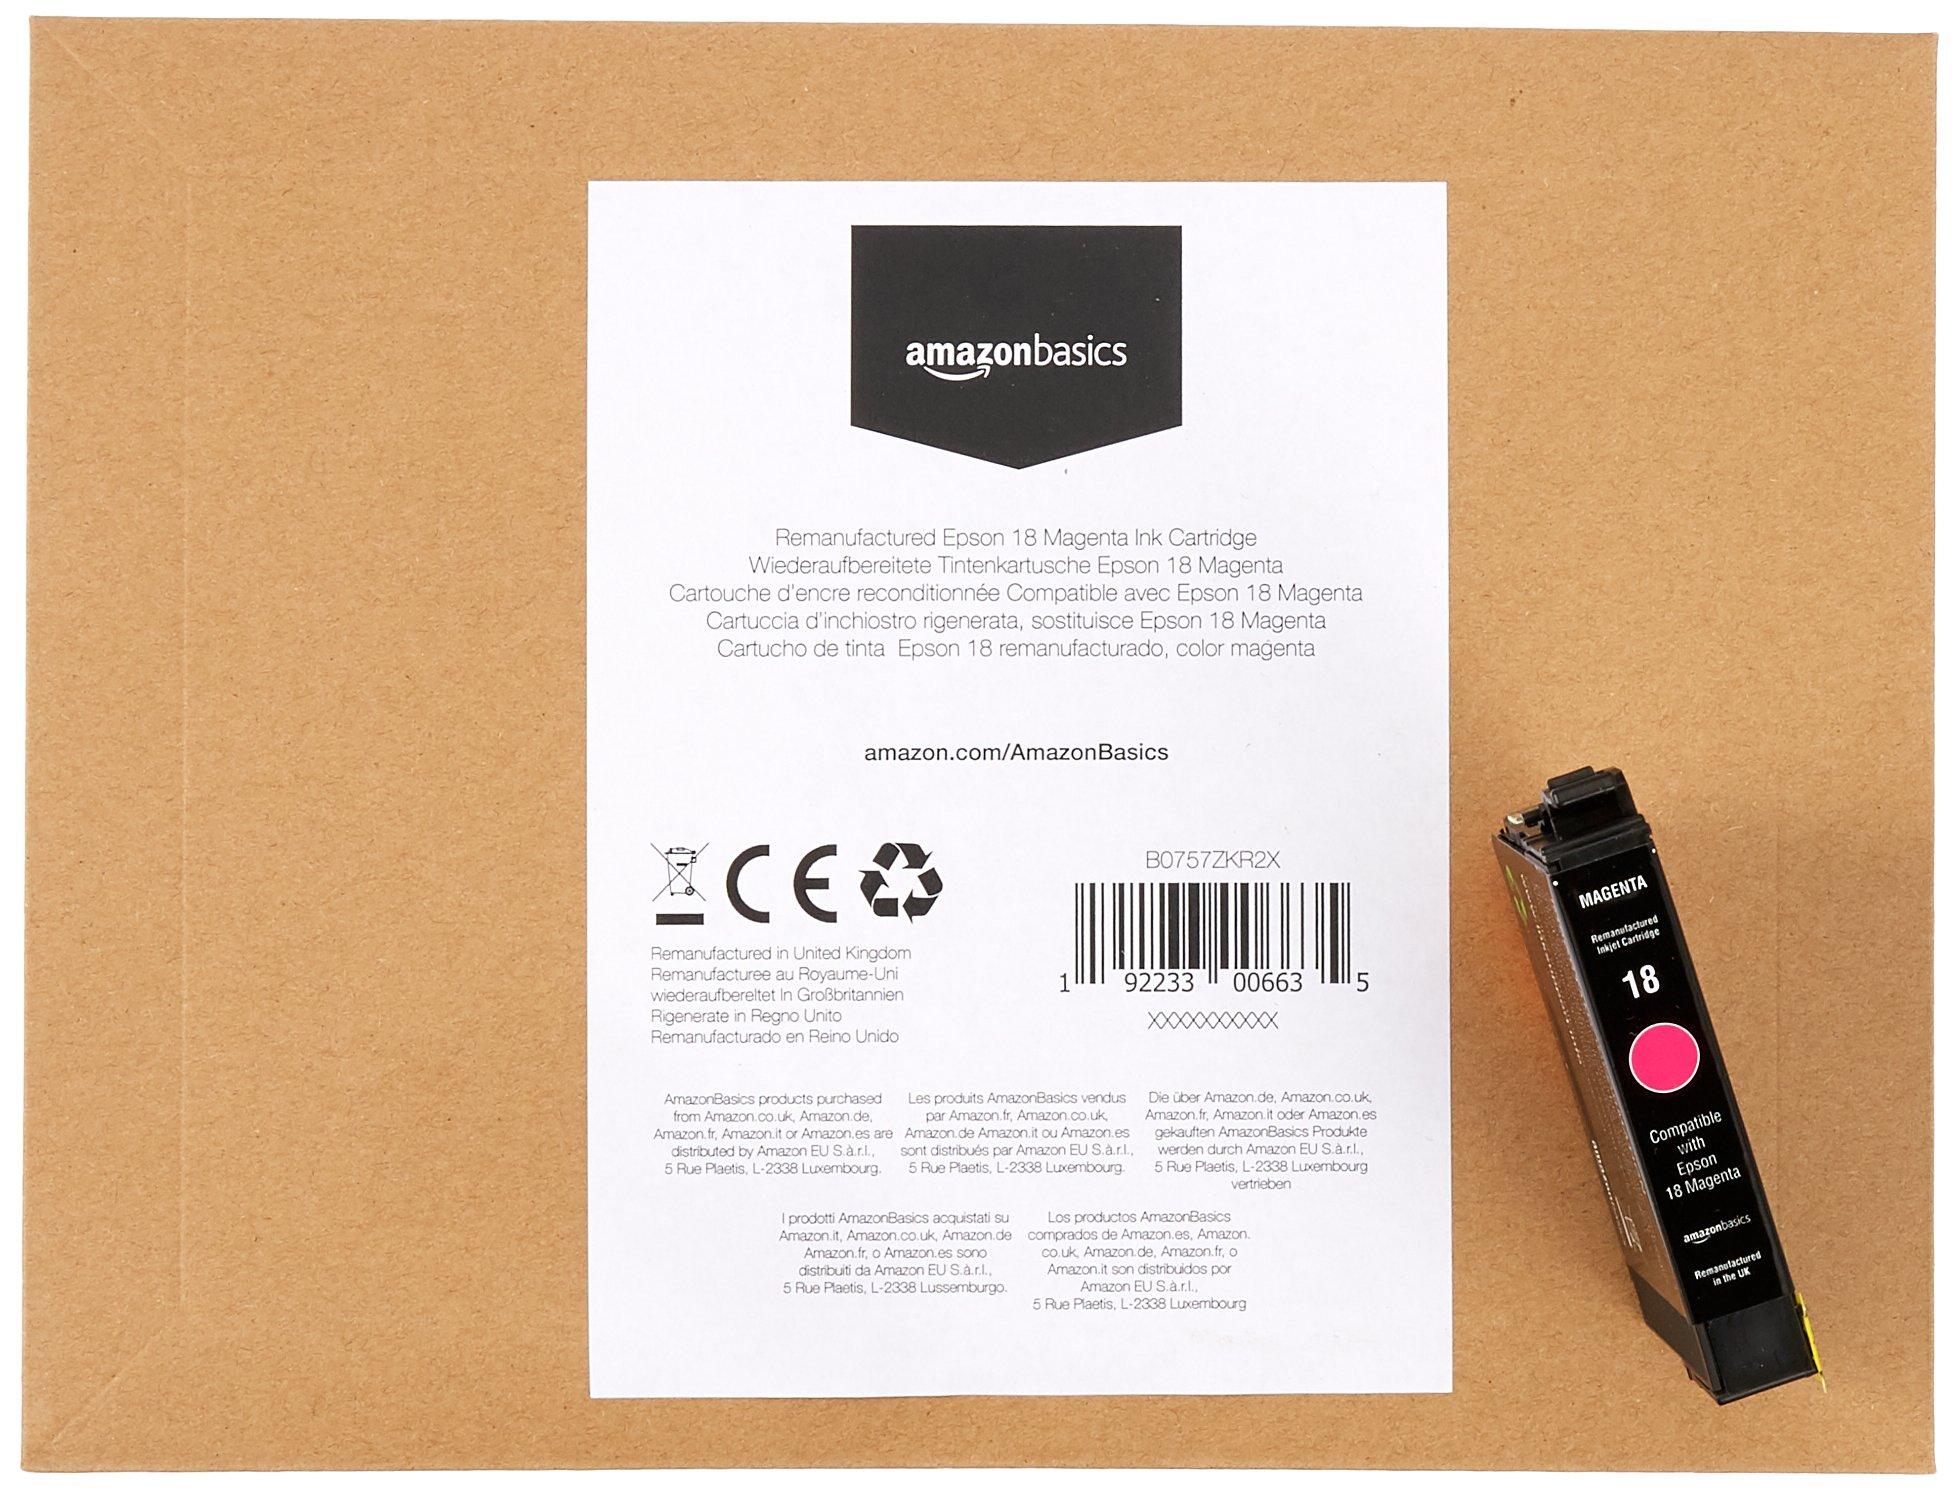 AmazonBasics-Wiederaufbereitete-Tintenpatrone-fr-Epson-Daisy